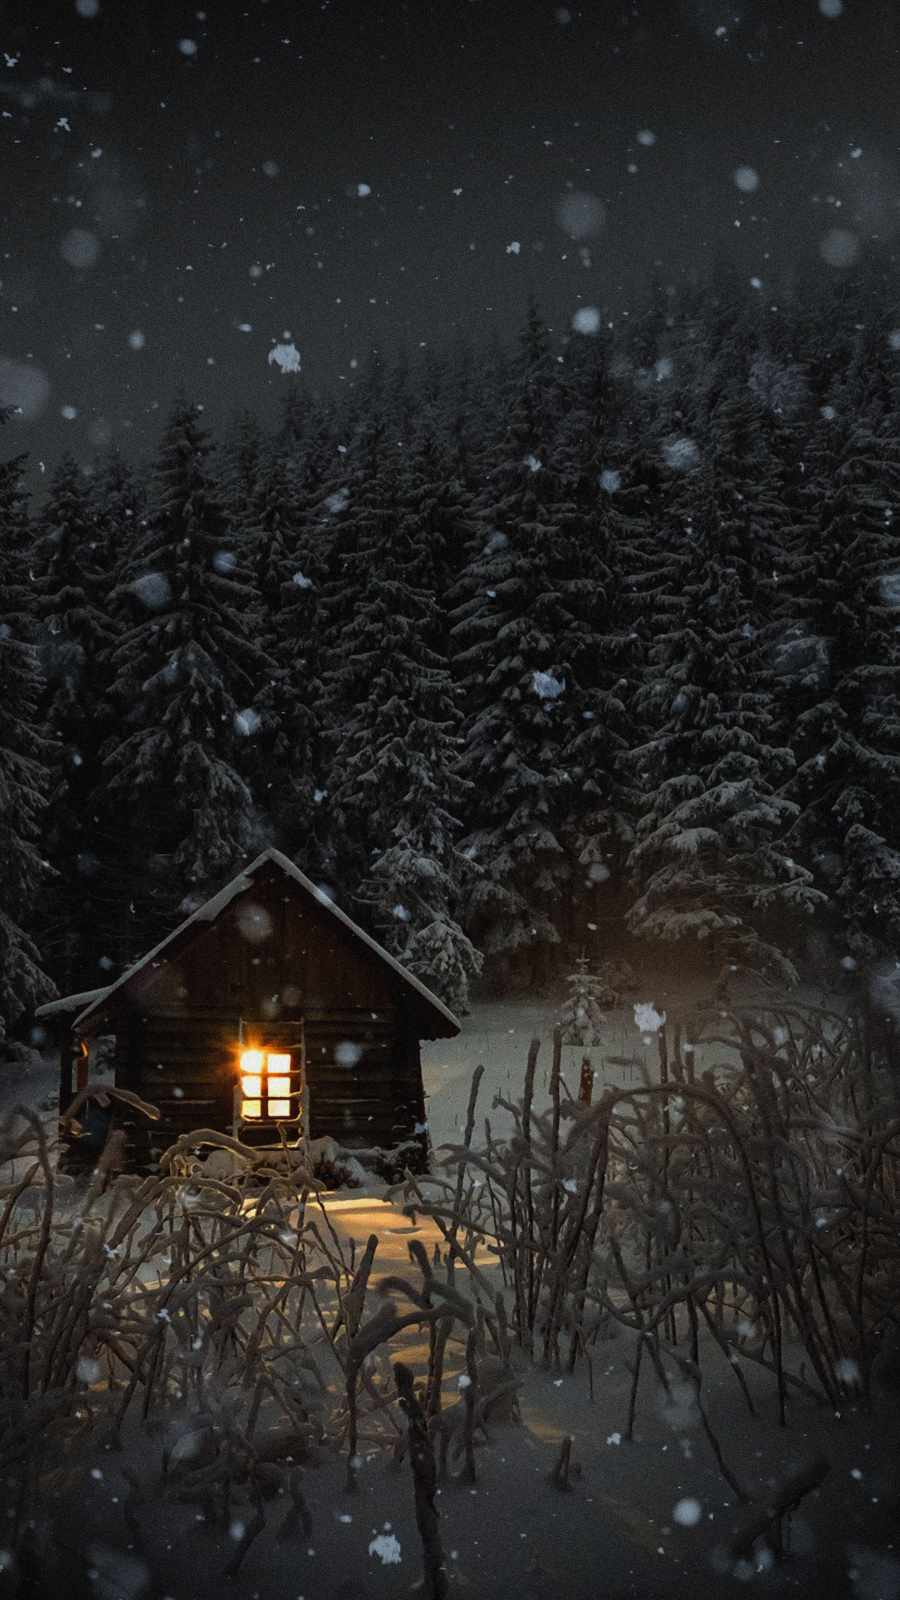 Winter Snow House iPhone Wallpaper